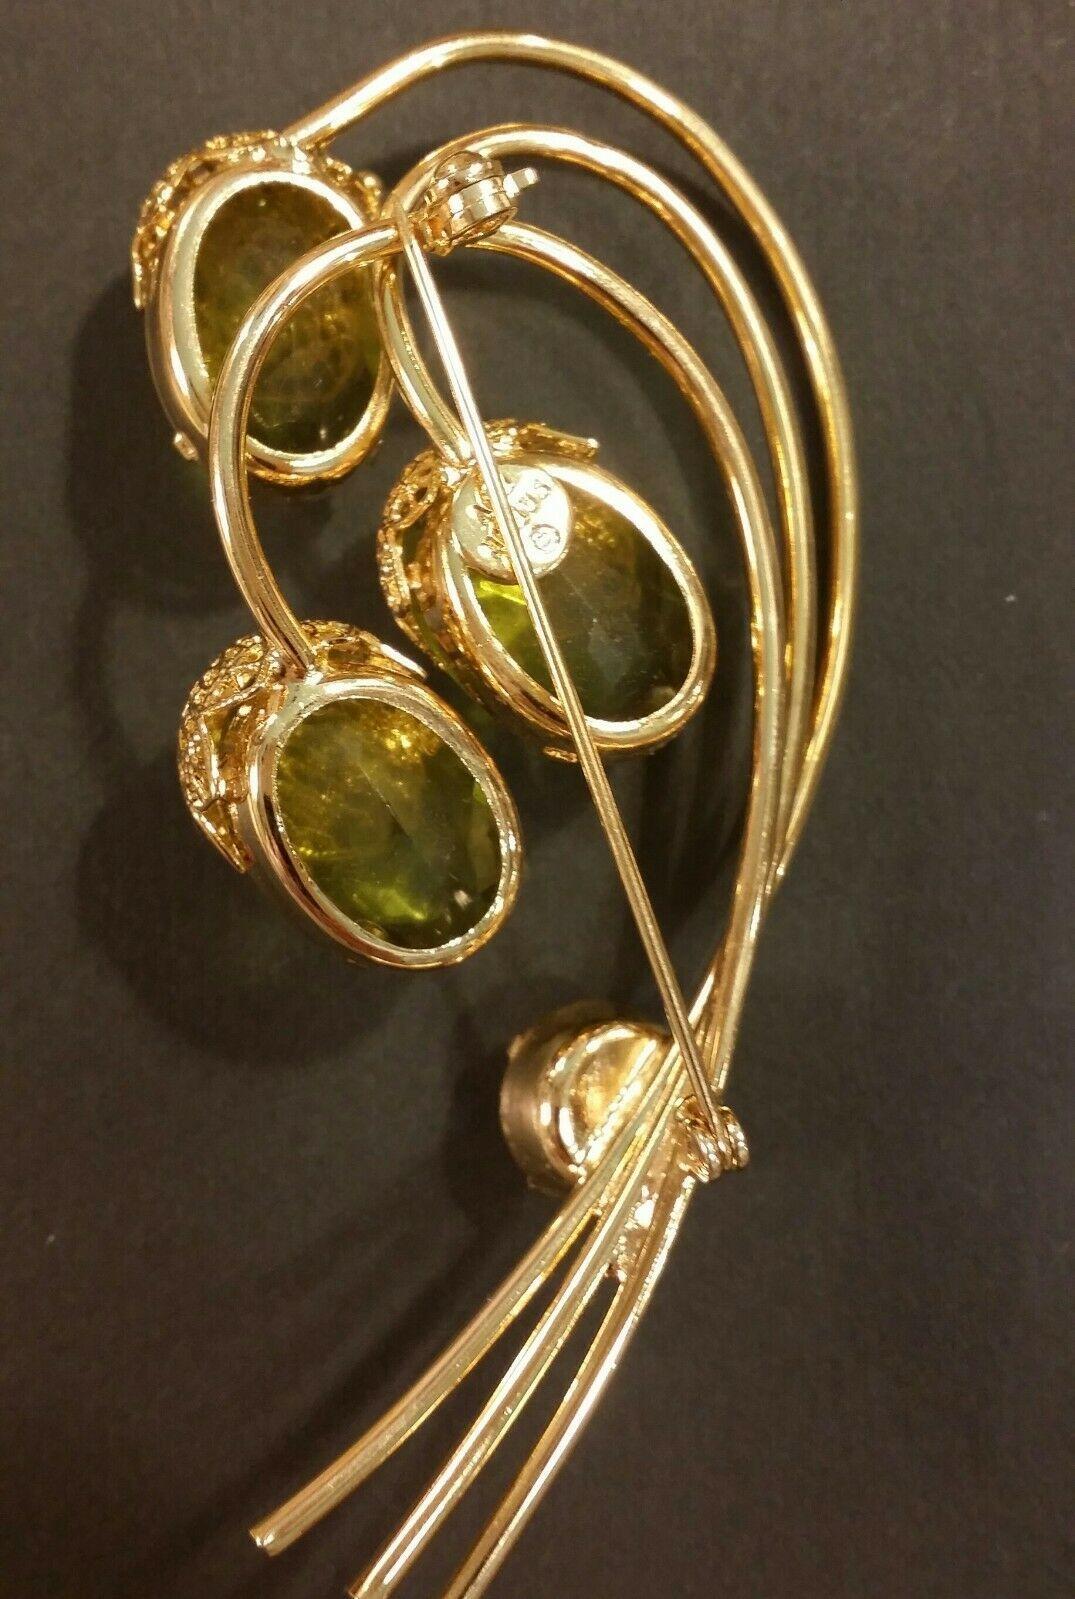 Vintage Sarah Coventry Brooch &Earring Set